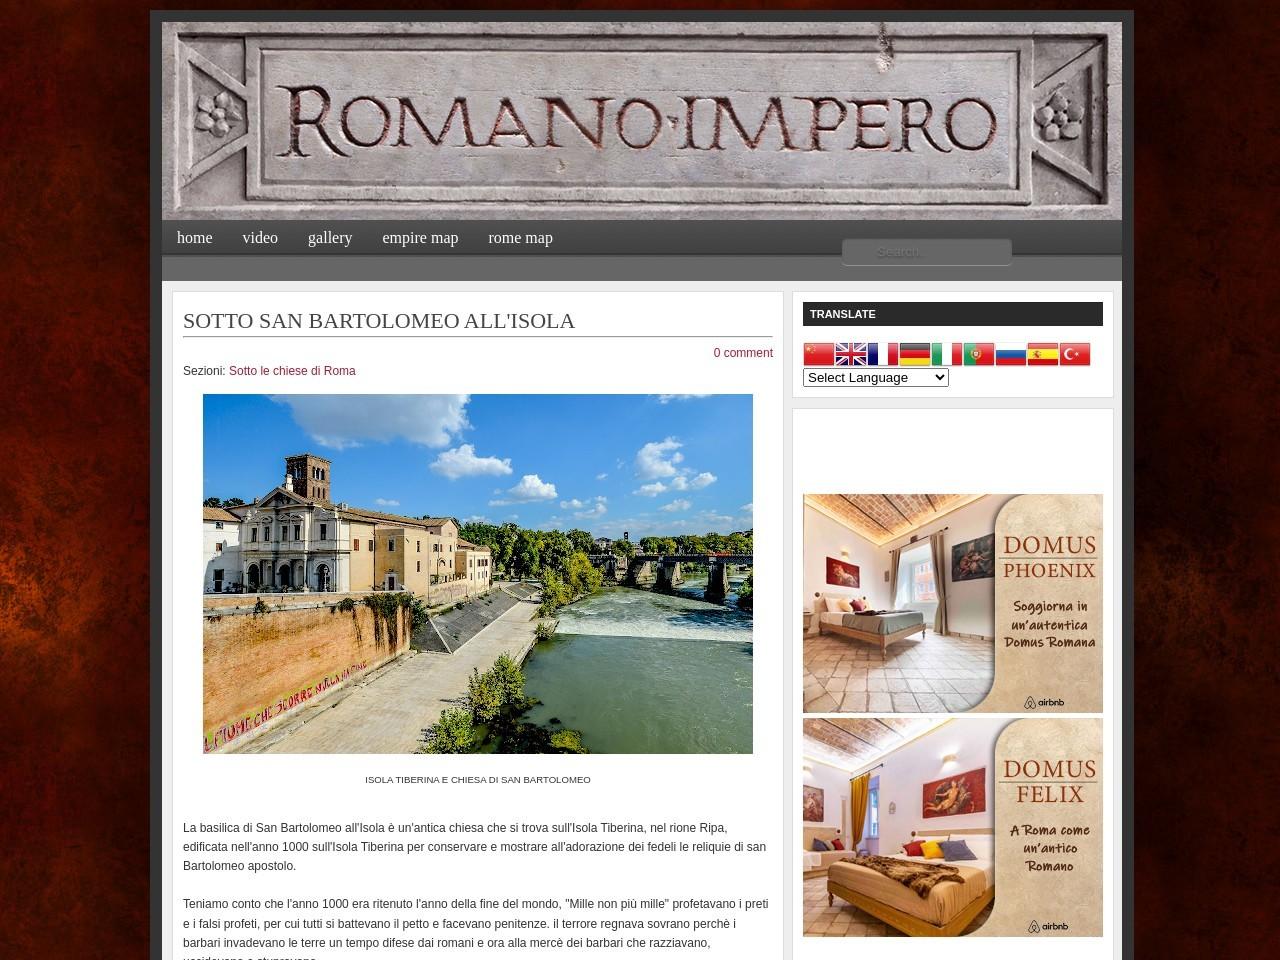 romano-impero